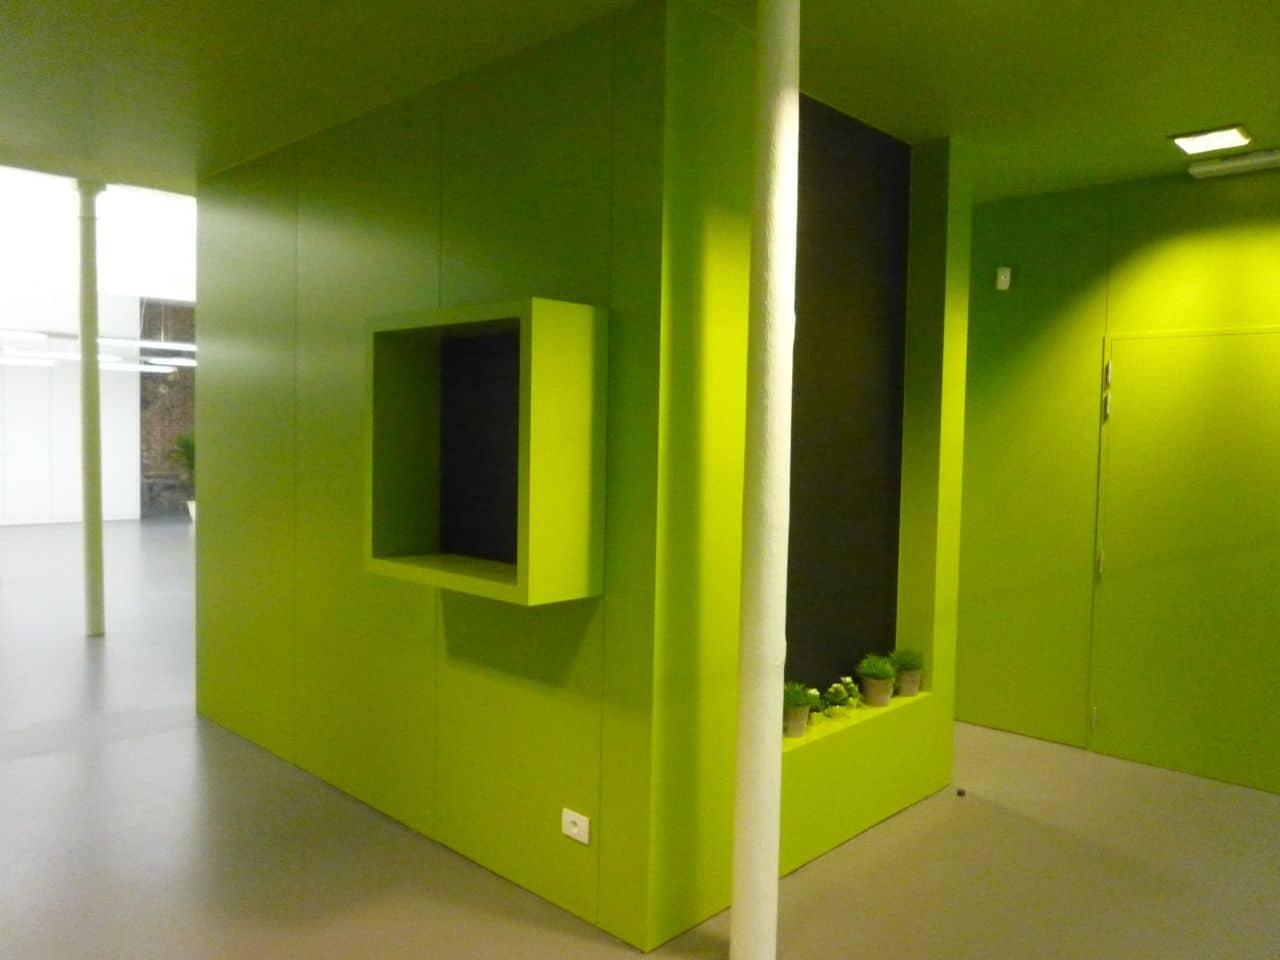 P1060739 | Baeyens & Beck architecten Gent | architect nieuwbouw renovatie interieur | high end | architectenbureau